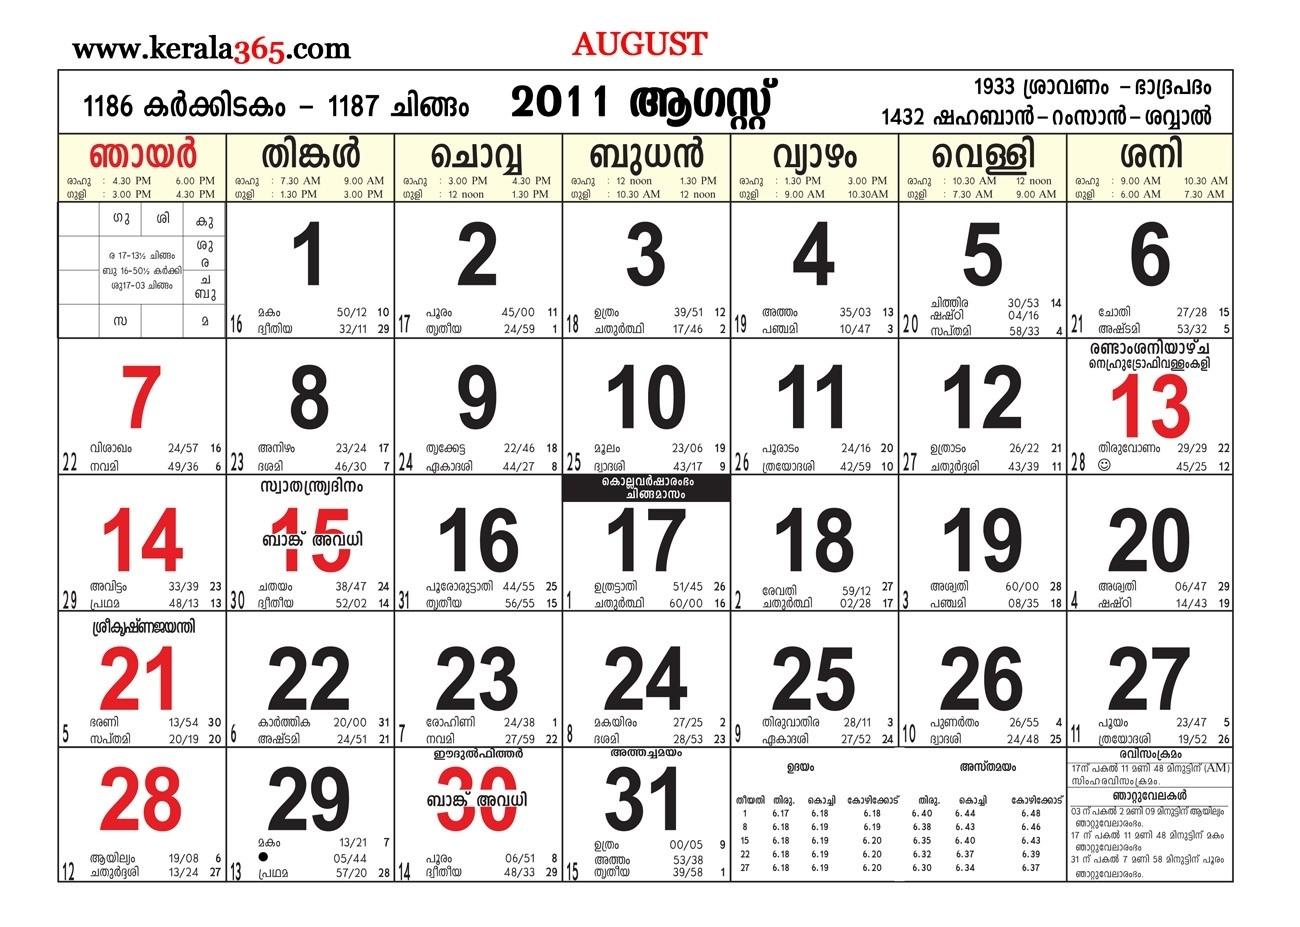 Calendar 2001 Malayalam August Image  Calendar Inspiration intended for Malayalam Calendar 2001